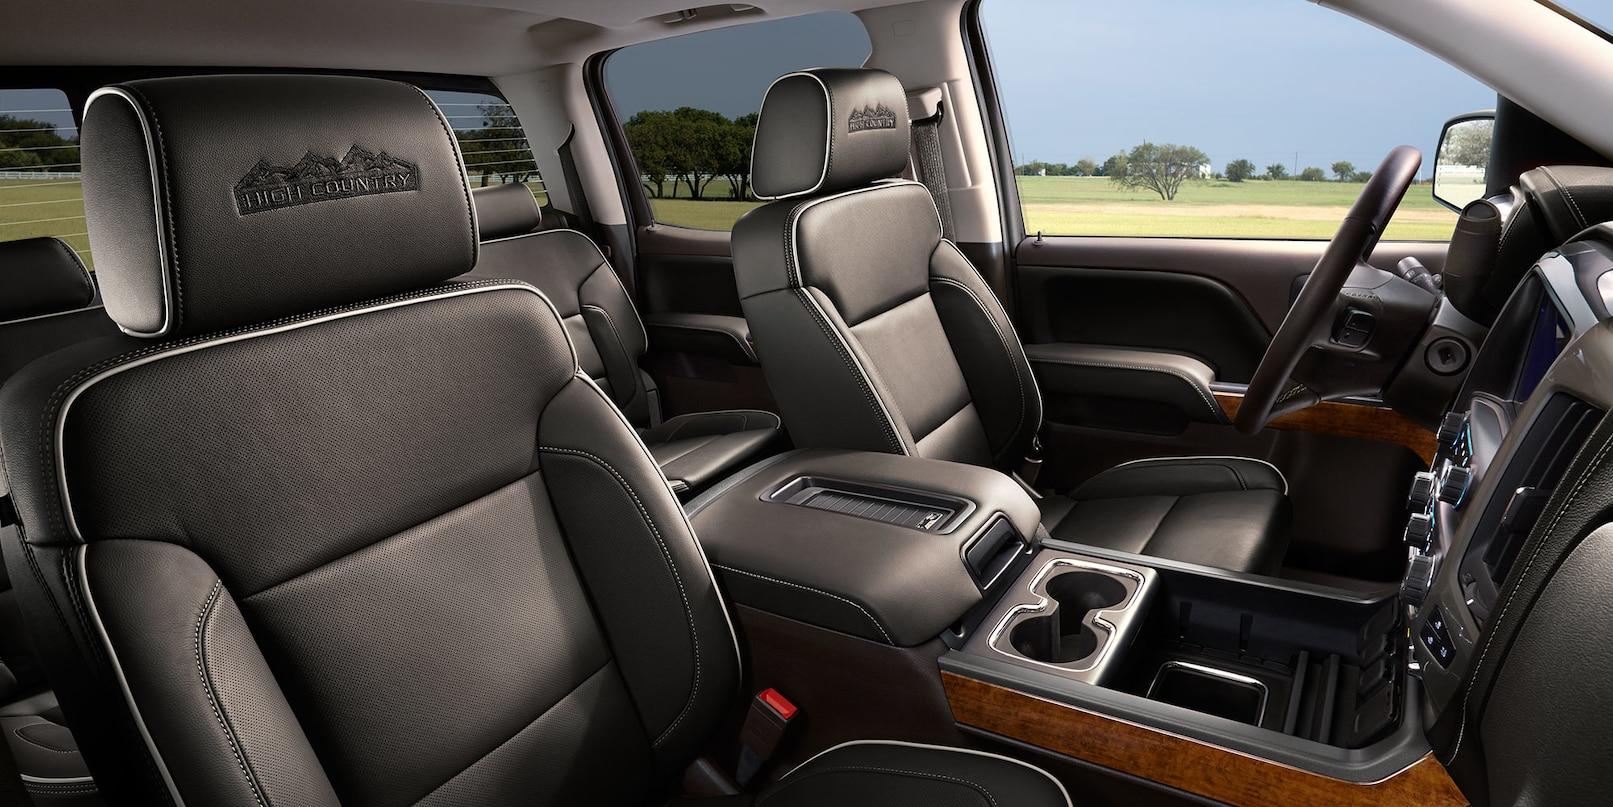 The Silverado 1500's Luxurious Interior